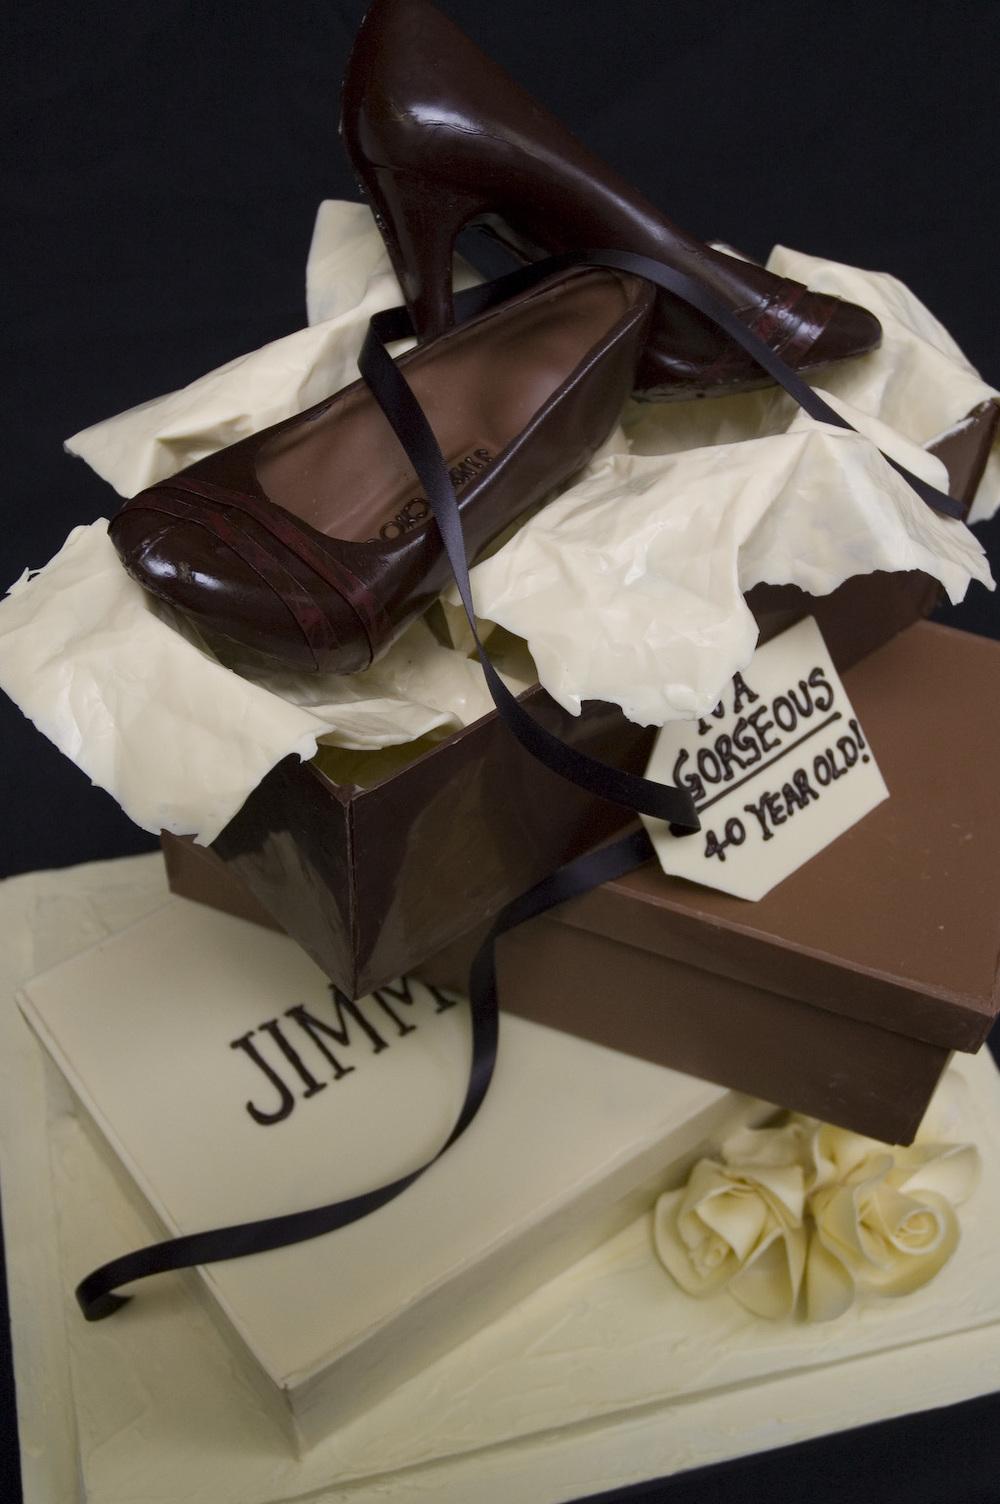 Jimmy Choo Cake sm 02.jpg